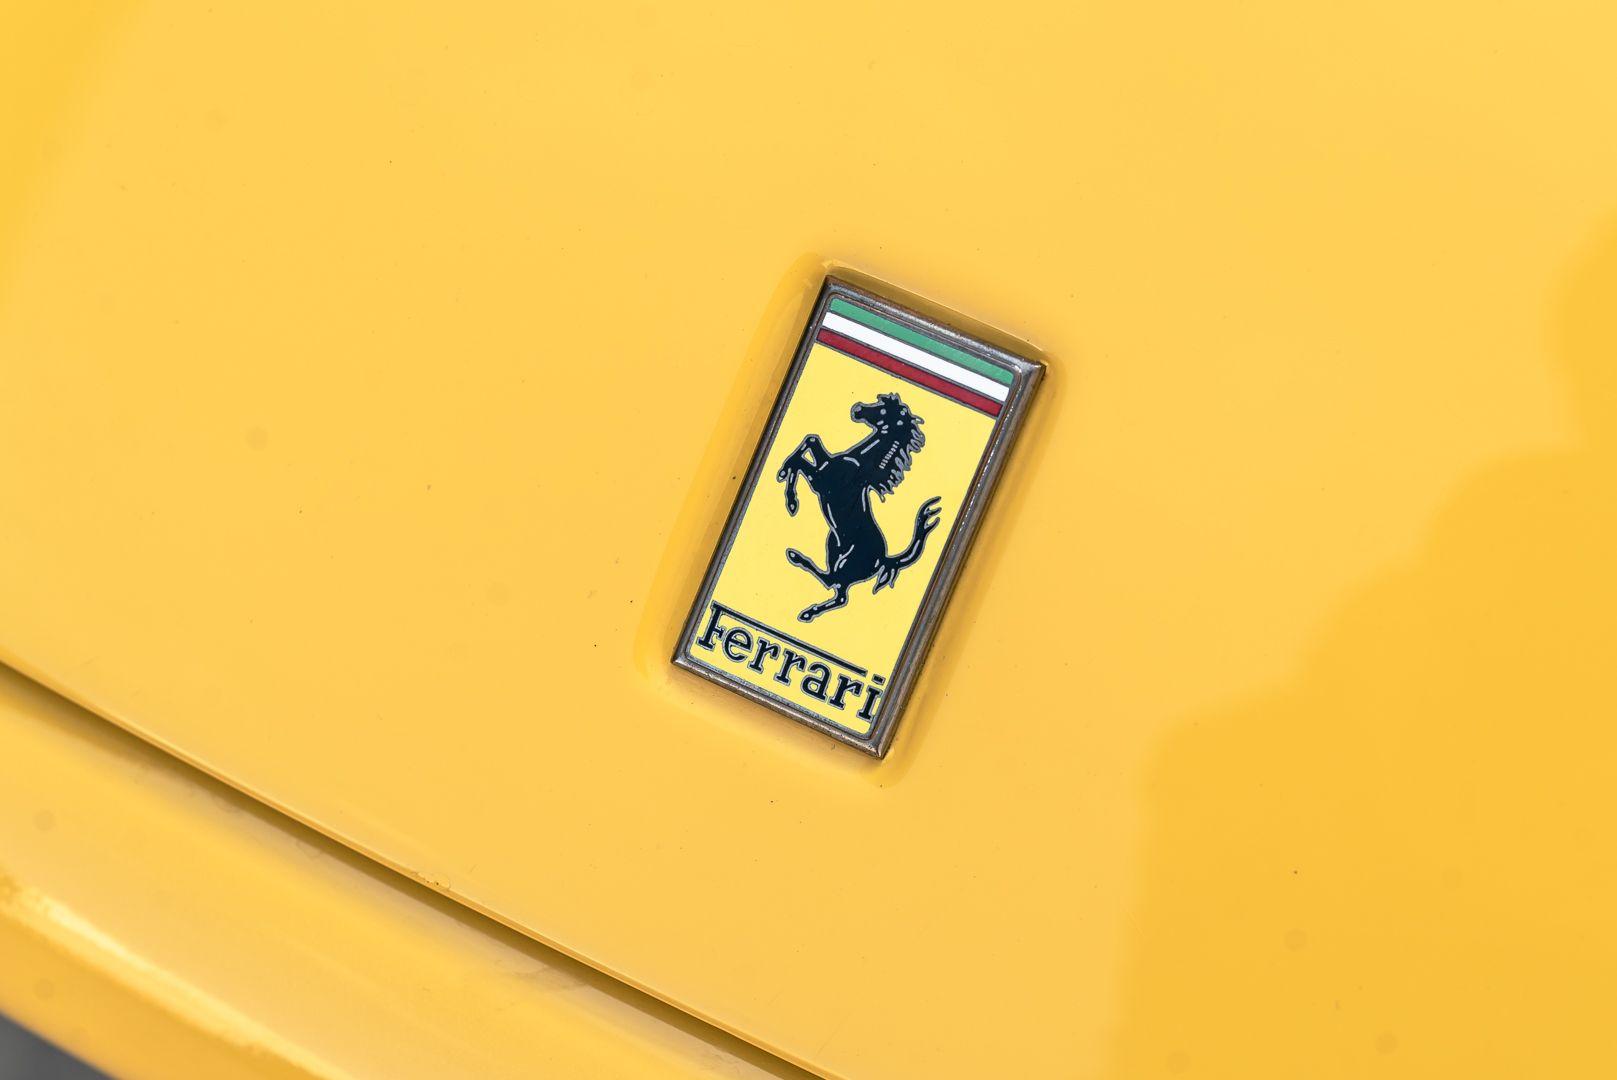 2002 Ferrari 575 Maranello F1 63766